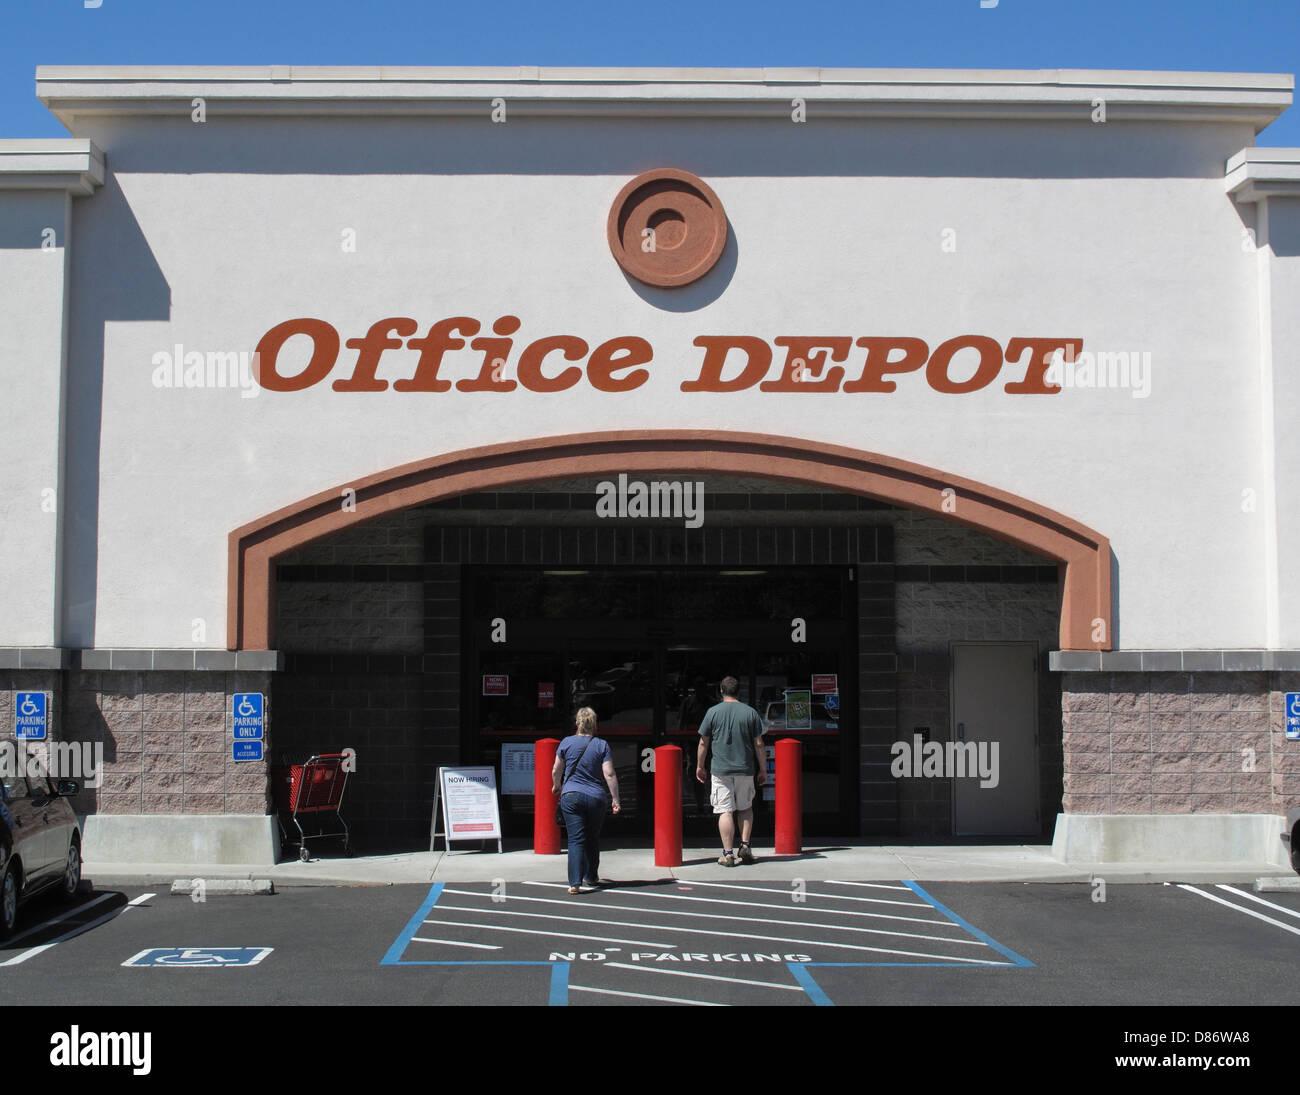 Office Depot Store In Los Gatos, California   Stock Image